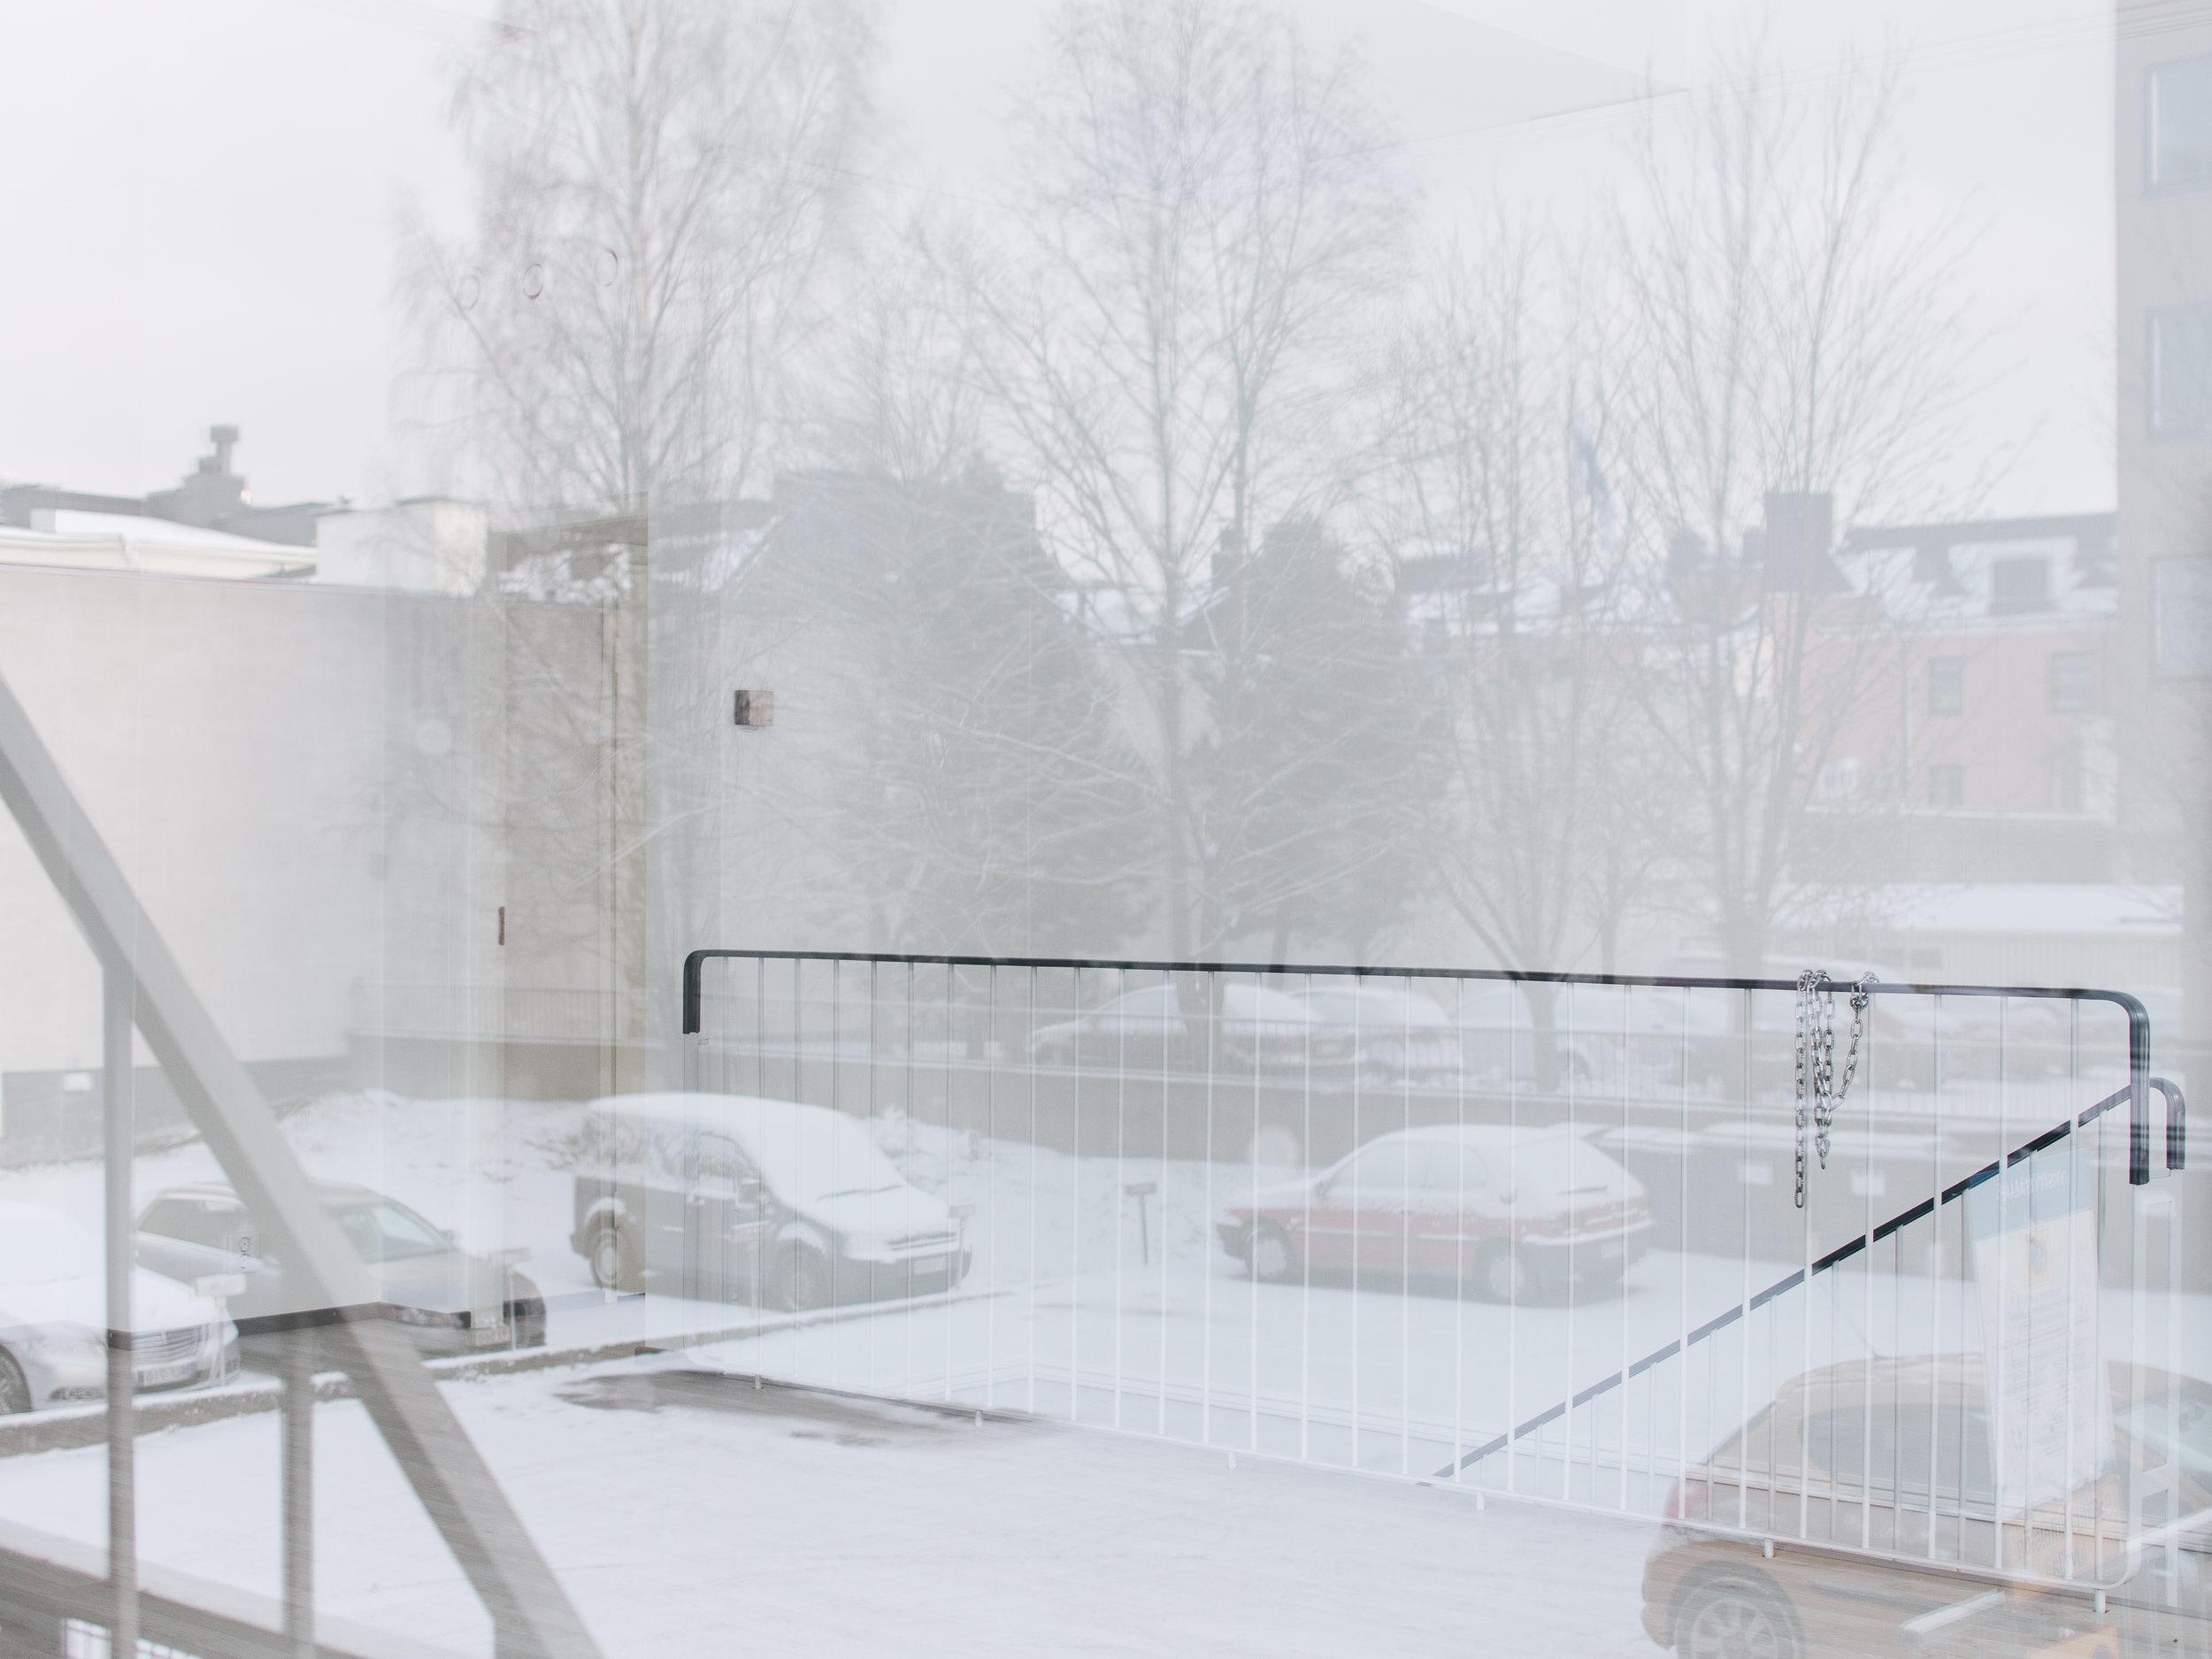 Lahti, Finland, December 2017